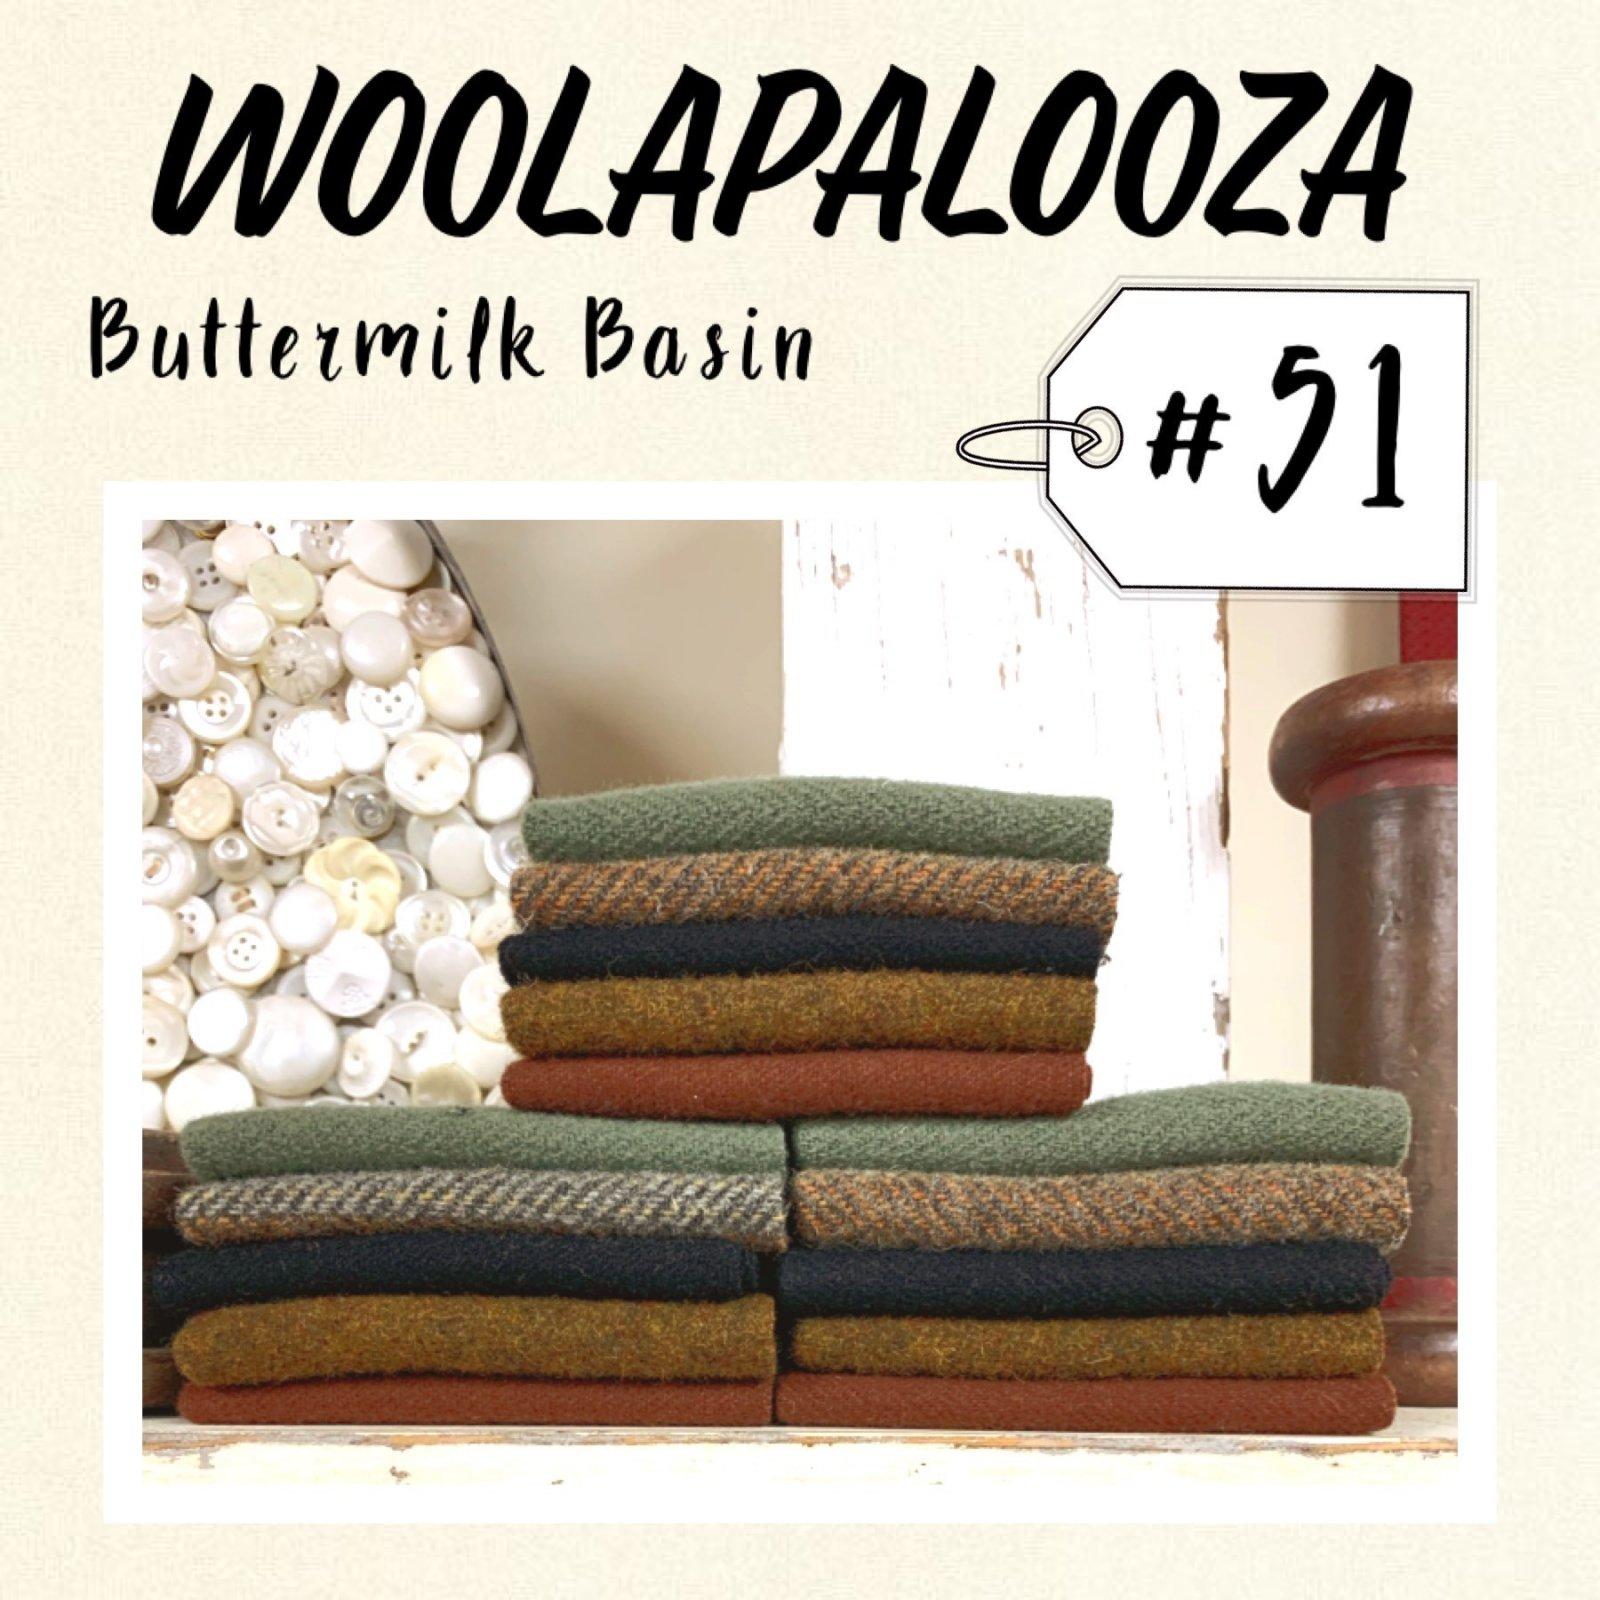 Woolapalooza #51 Wool Bundle